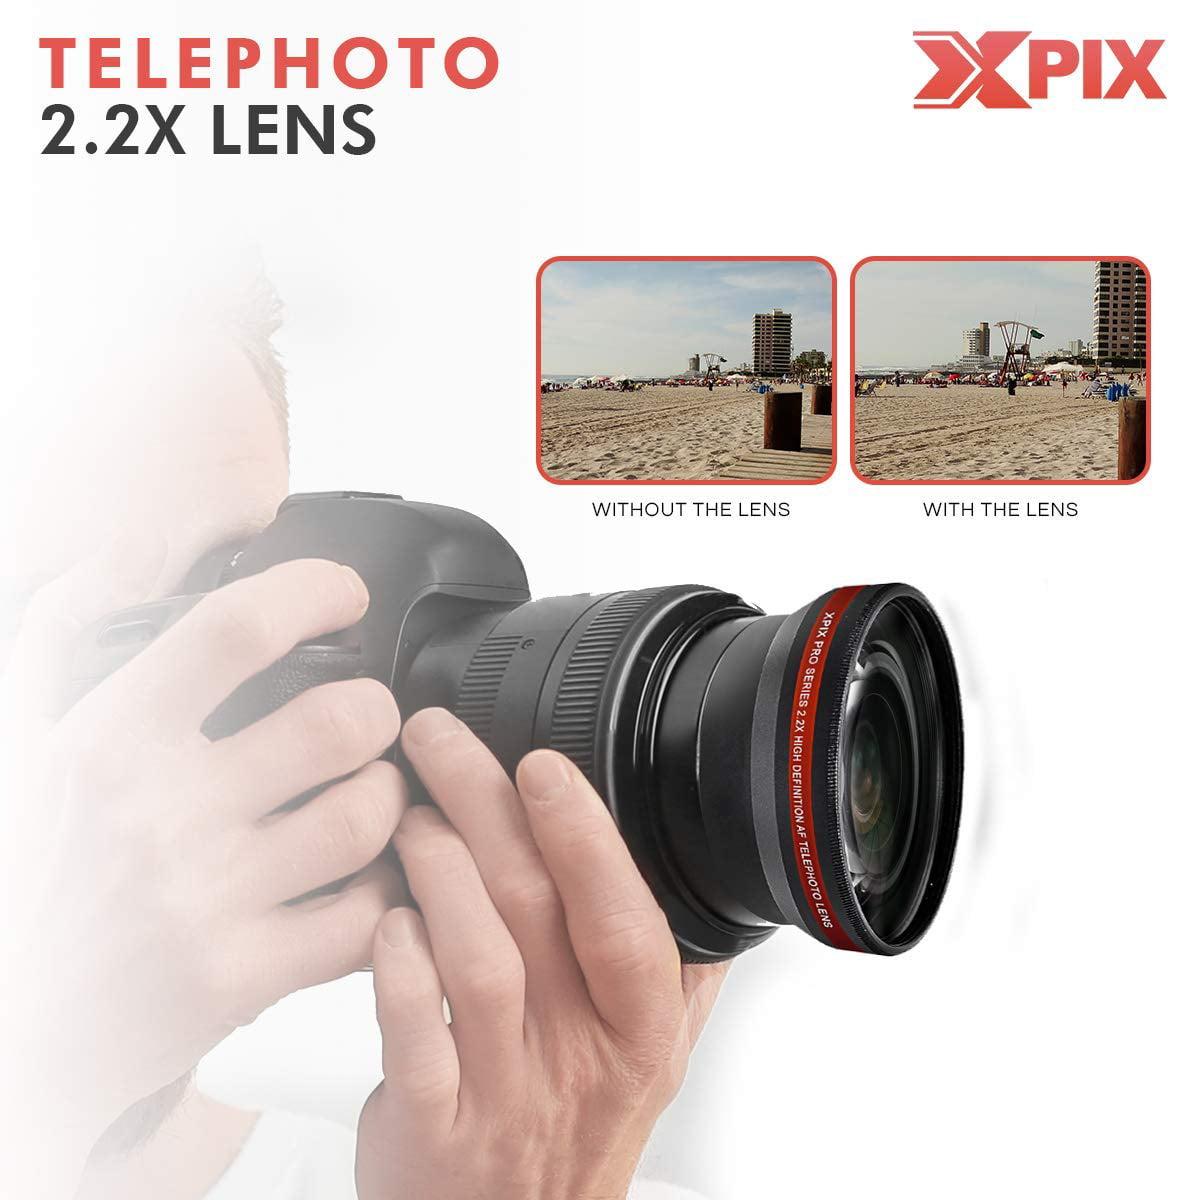 32GB Nikon D5600 for Dummies Lenses Remote Filters DSLR Backpack Deluxe Accessory Bundle W//Xpix Tripods Xpix Cleaning Kit